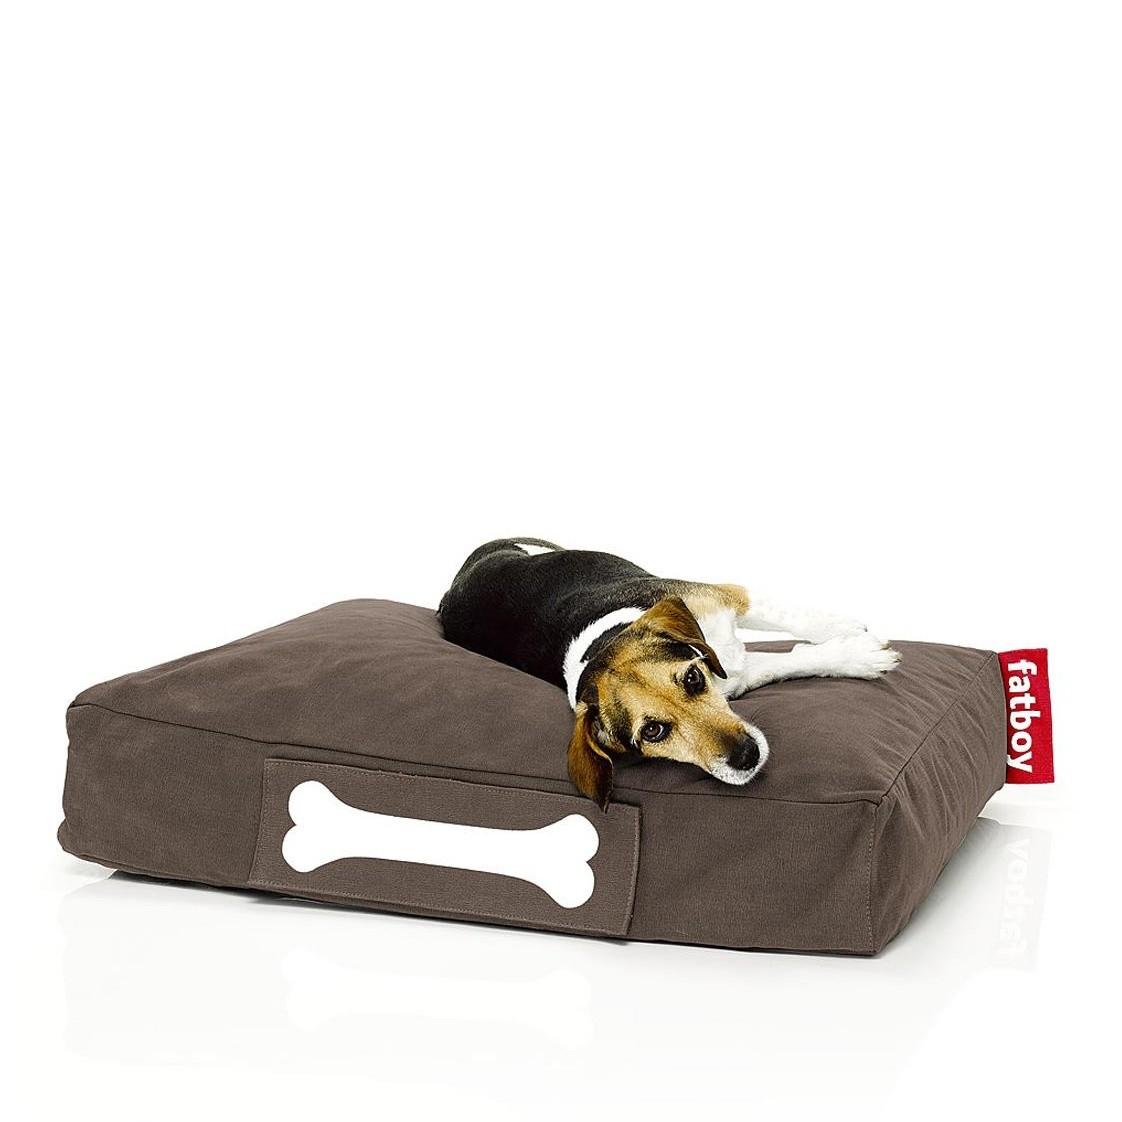 fatboy doggielounge stonewashed 60x80cm fatboy. Black Bedroom Furniture Sets. Home Design Ideas